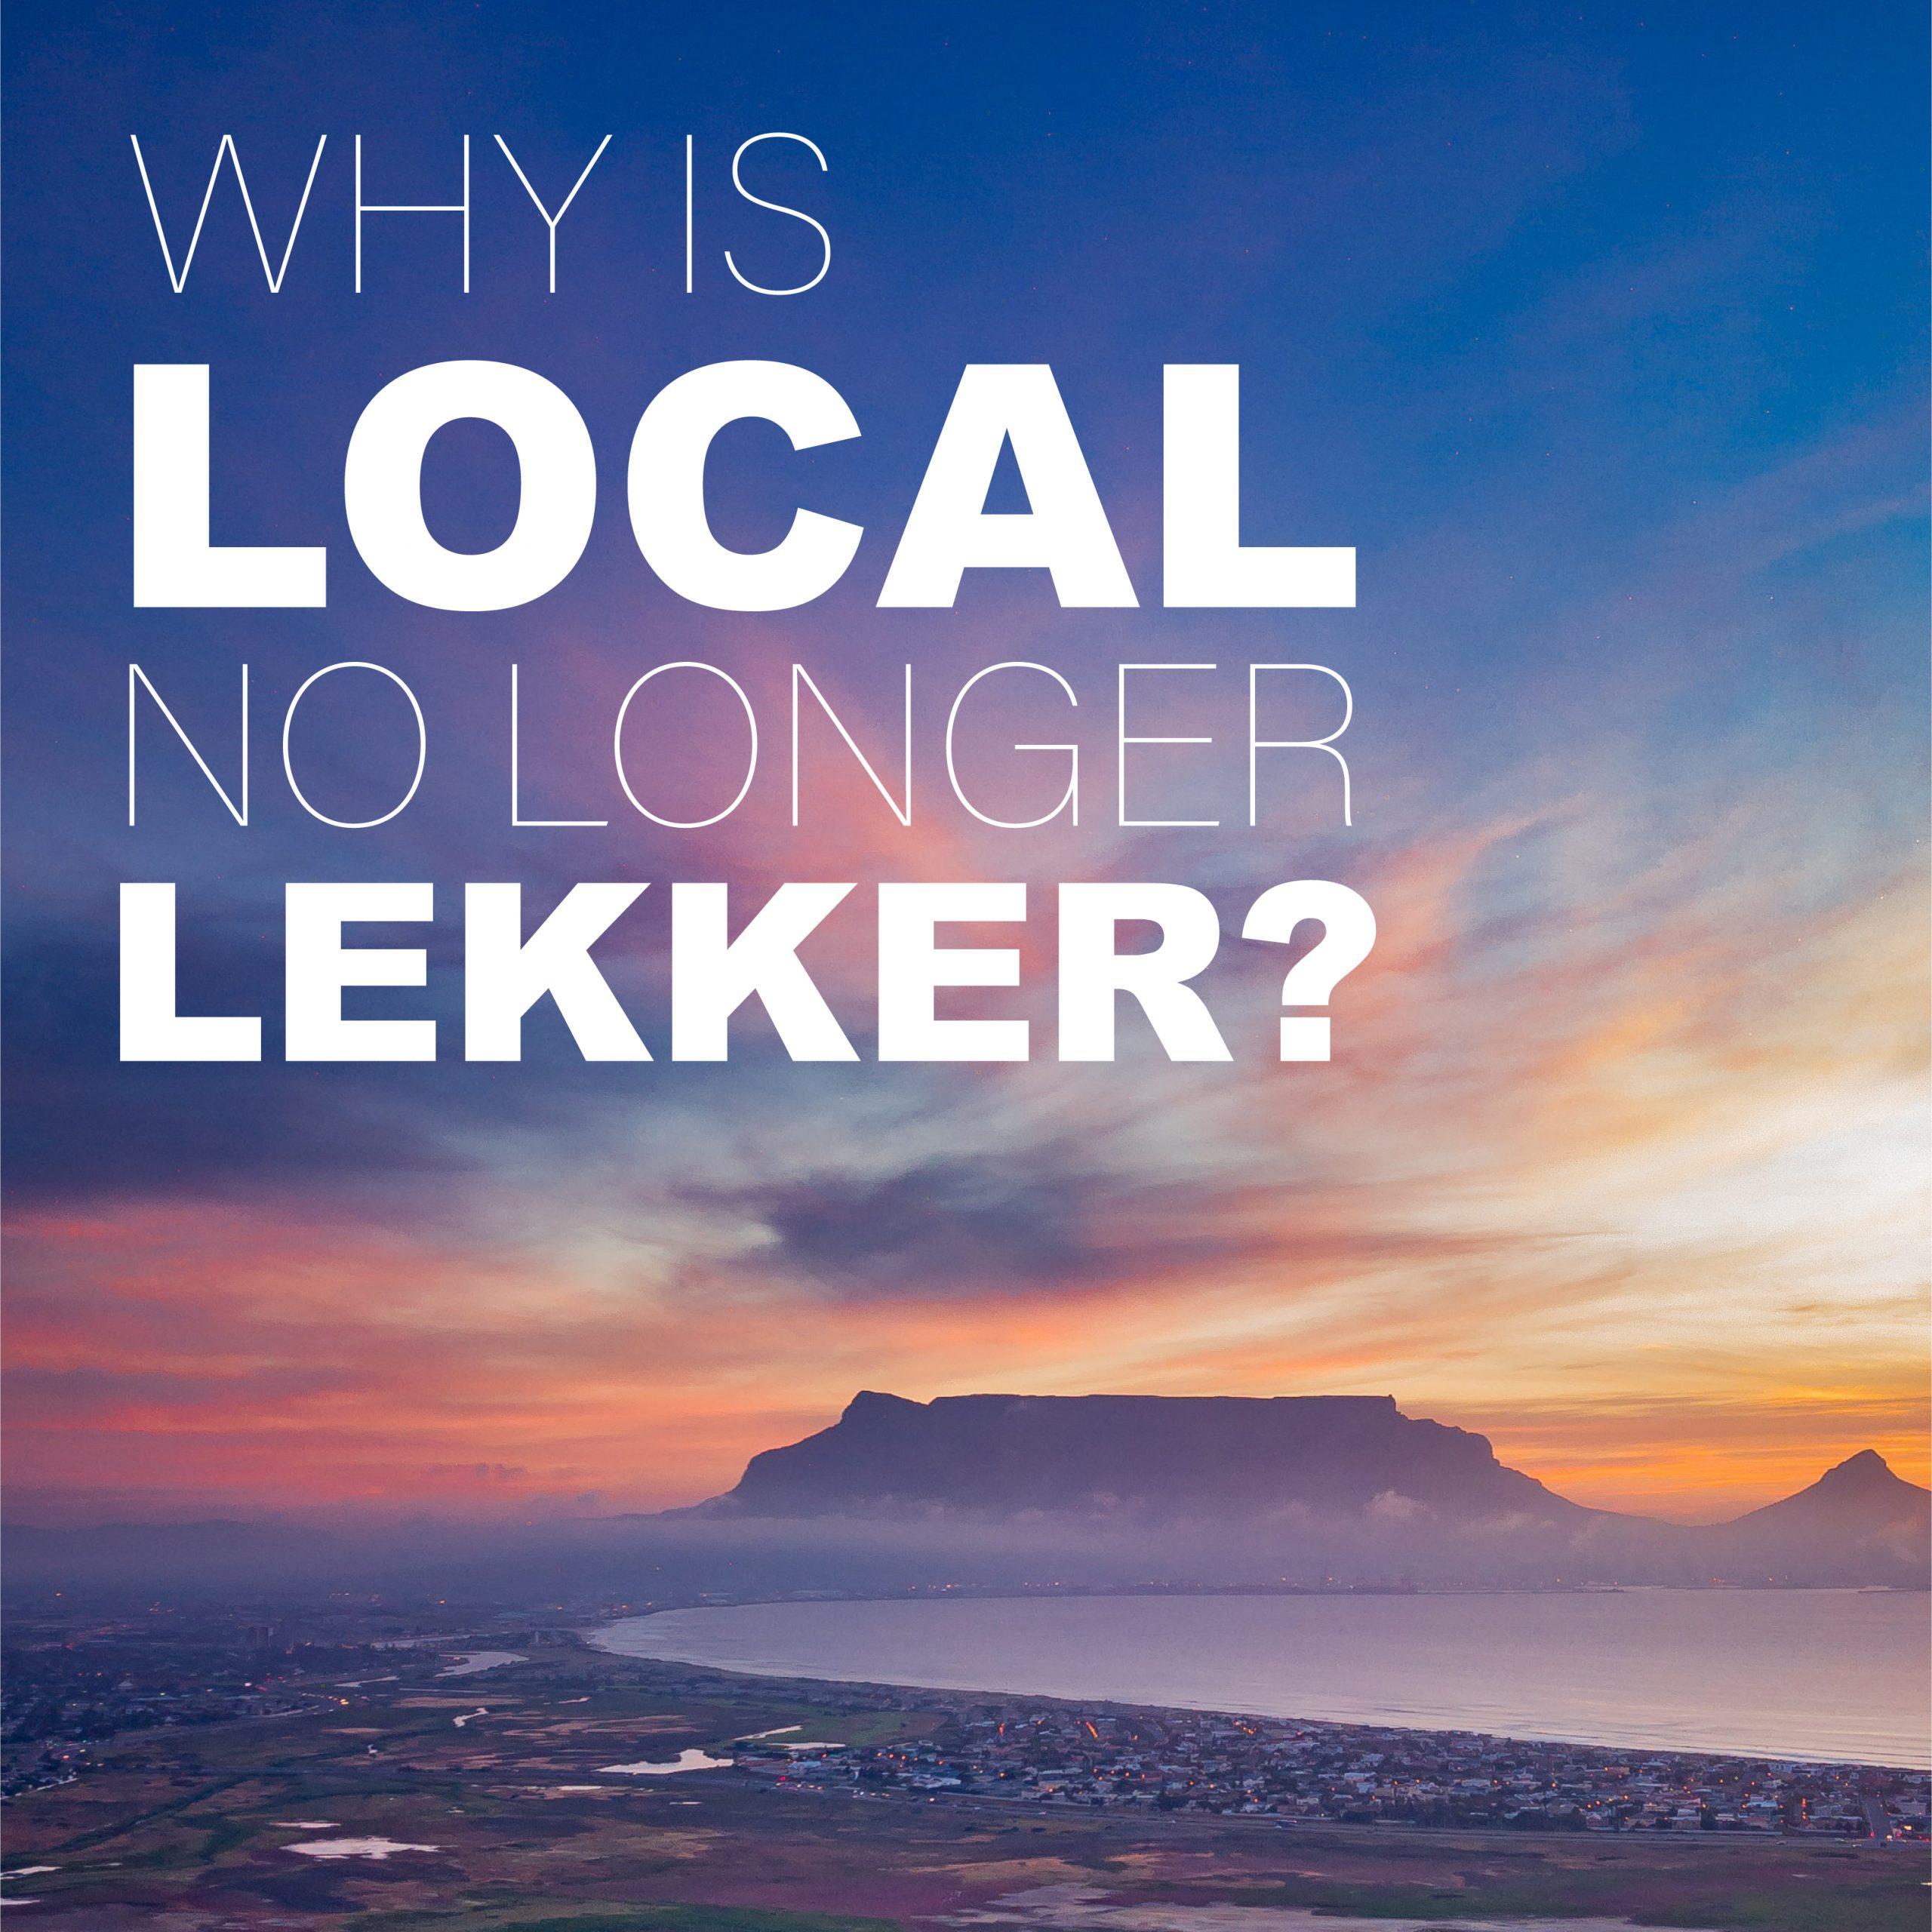 Social-Media-Why-Is-Local-No-Longer-Lekker-scaled.jpg